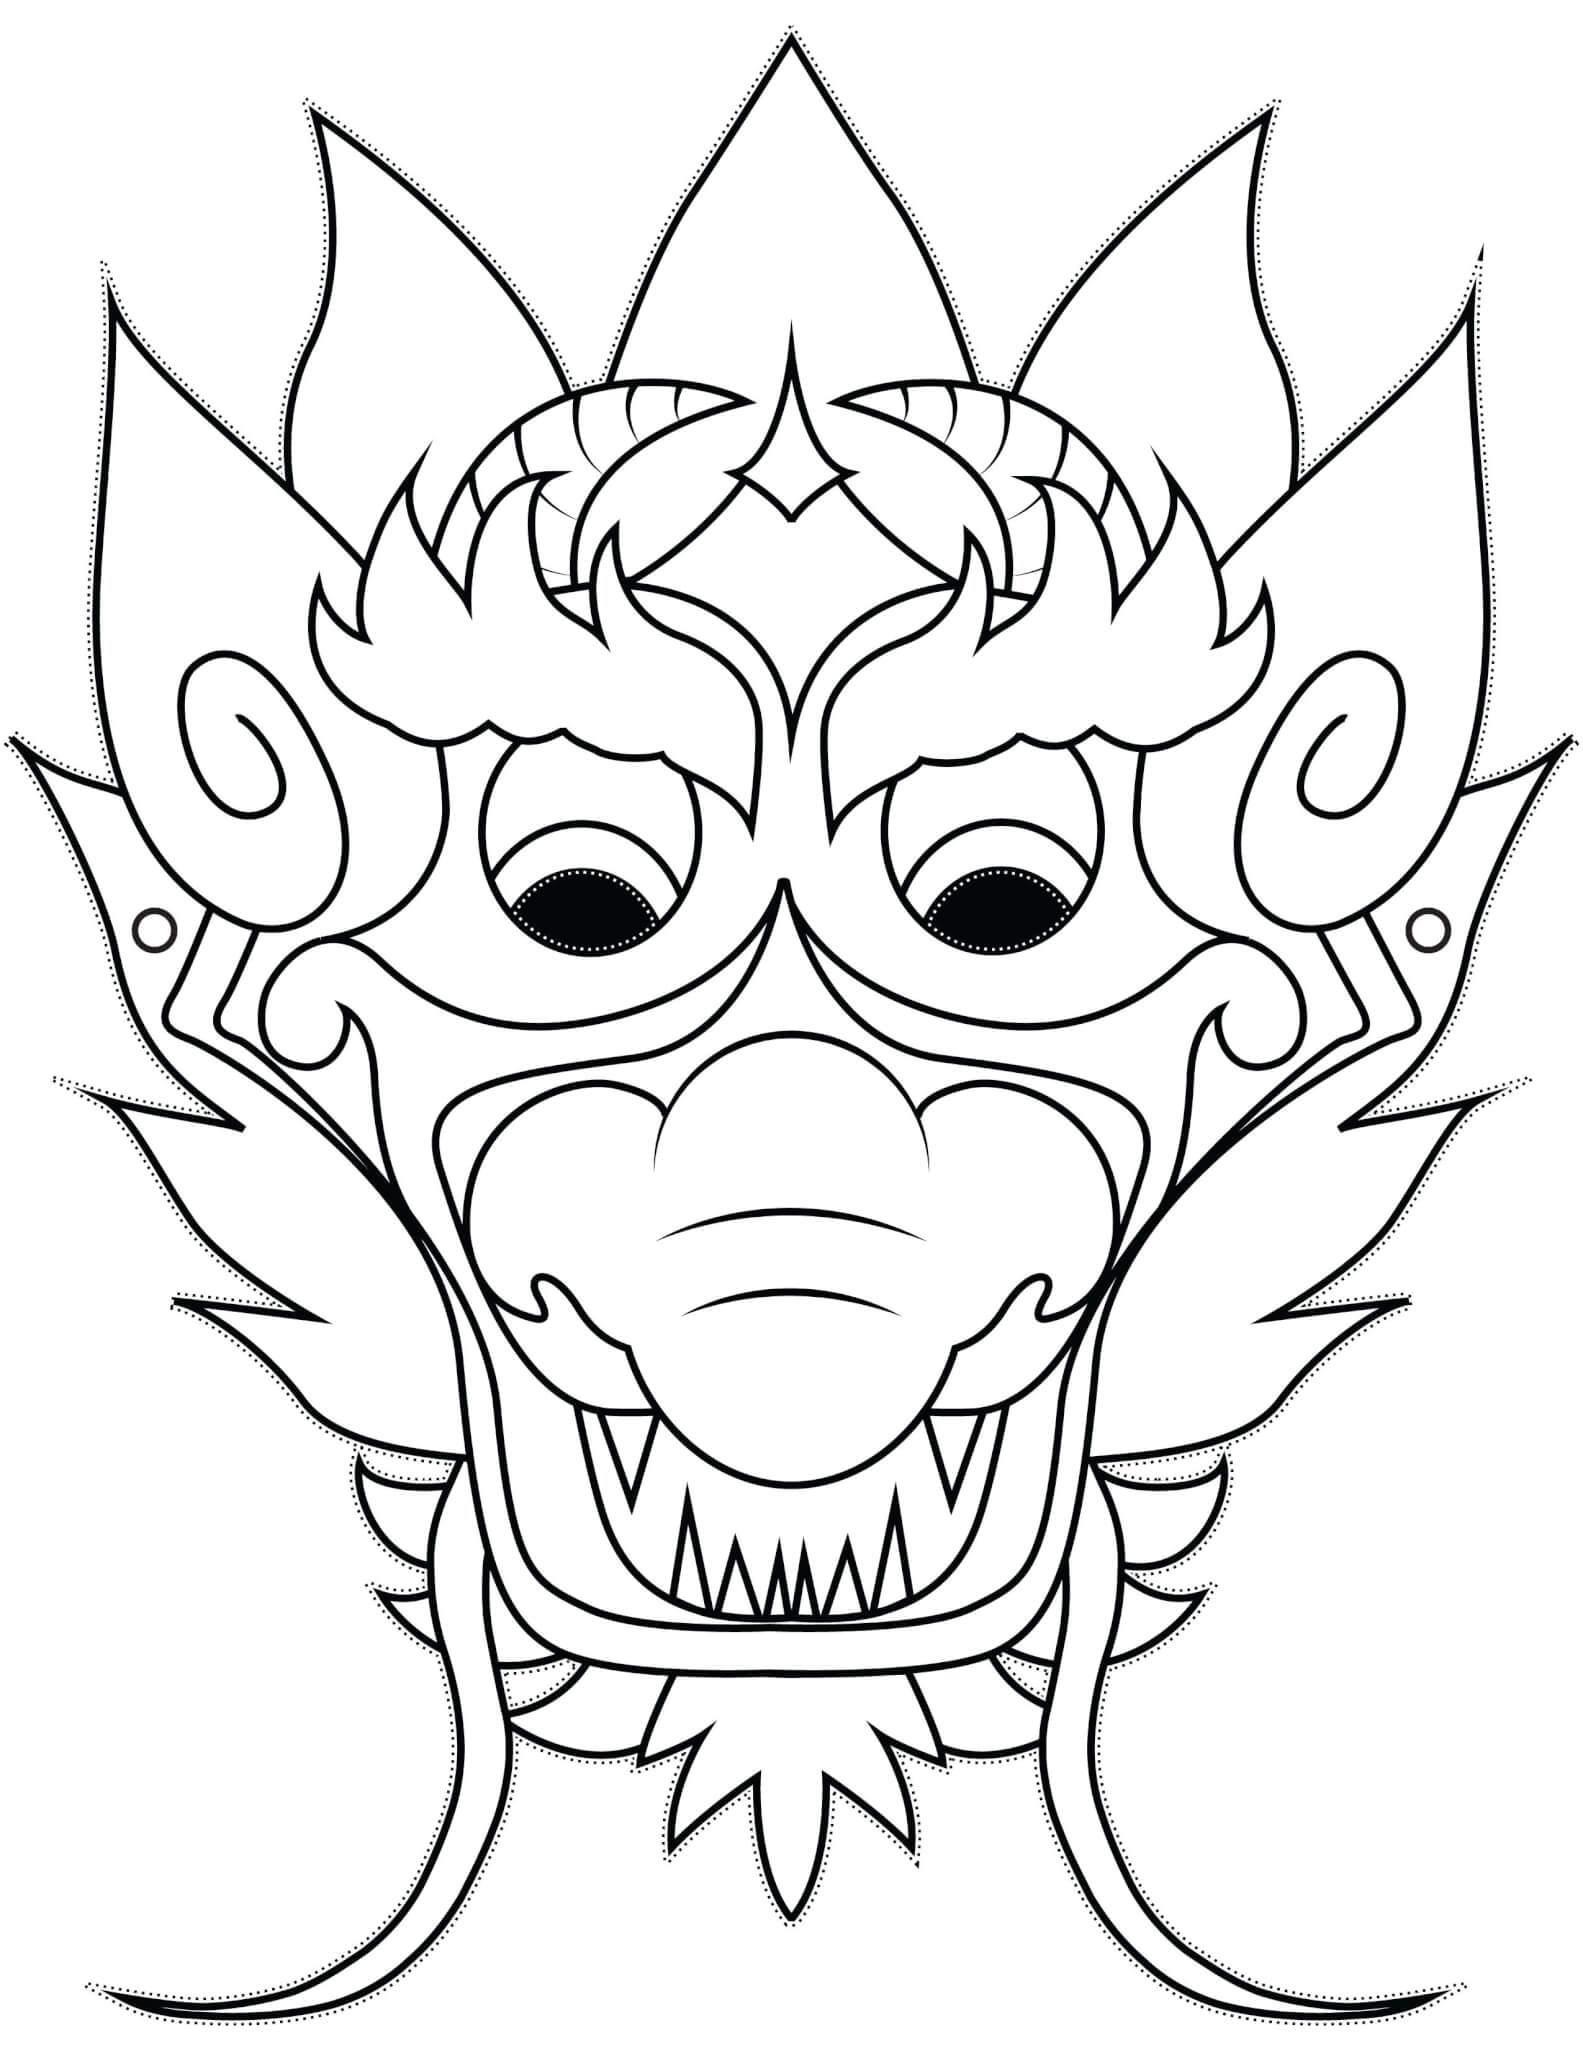 Maschera da colorare per bambini di mostri 🎃 - 2021